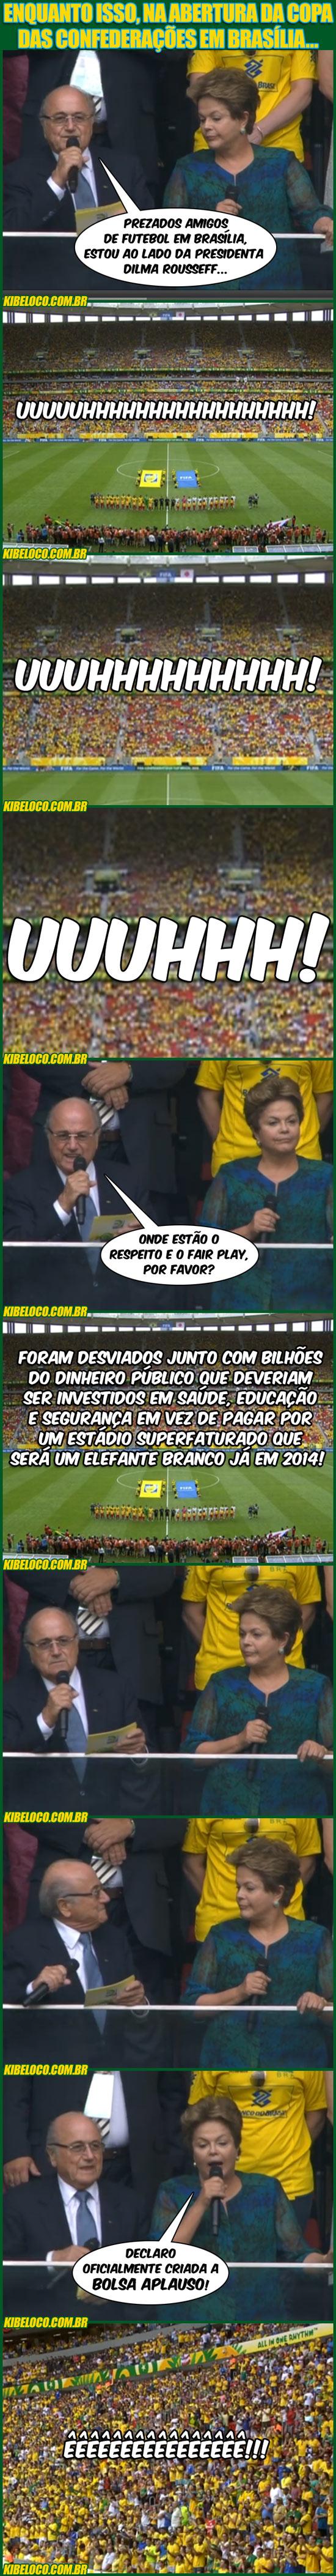 Quem tem boca vaia Dilma!